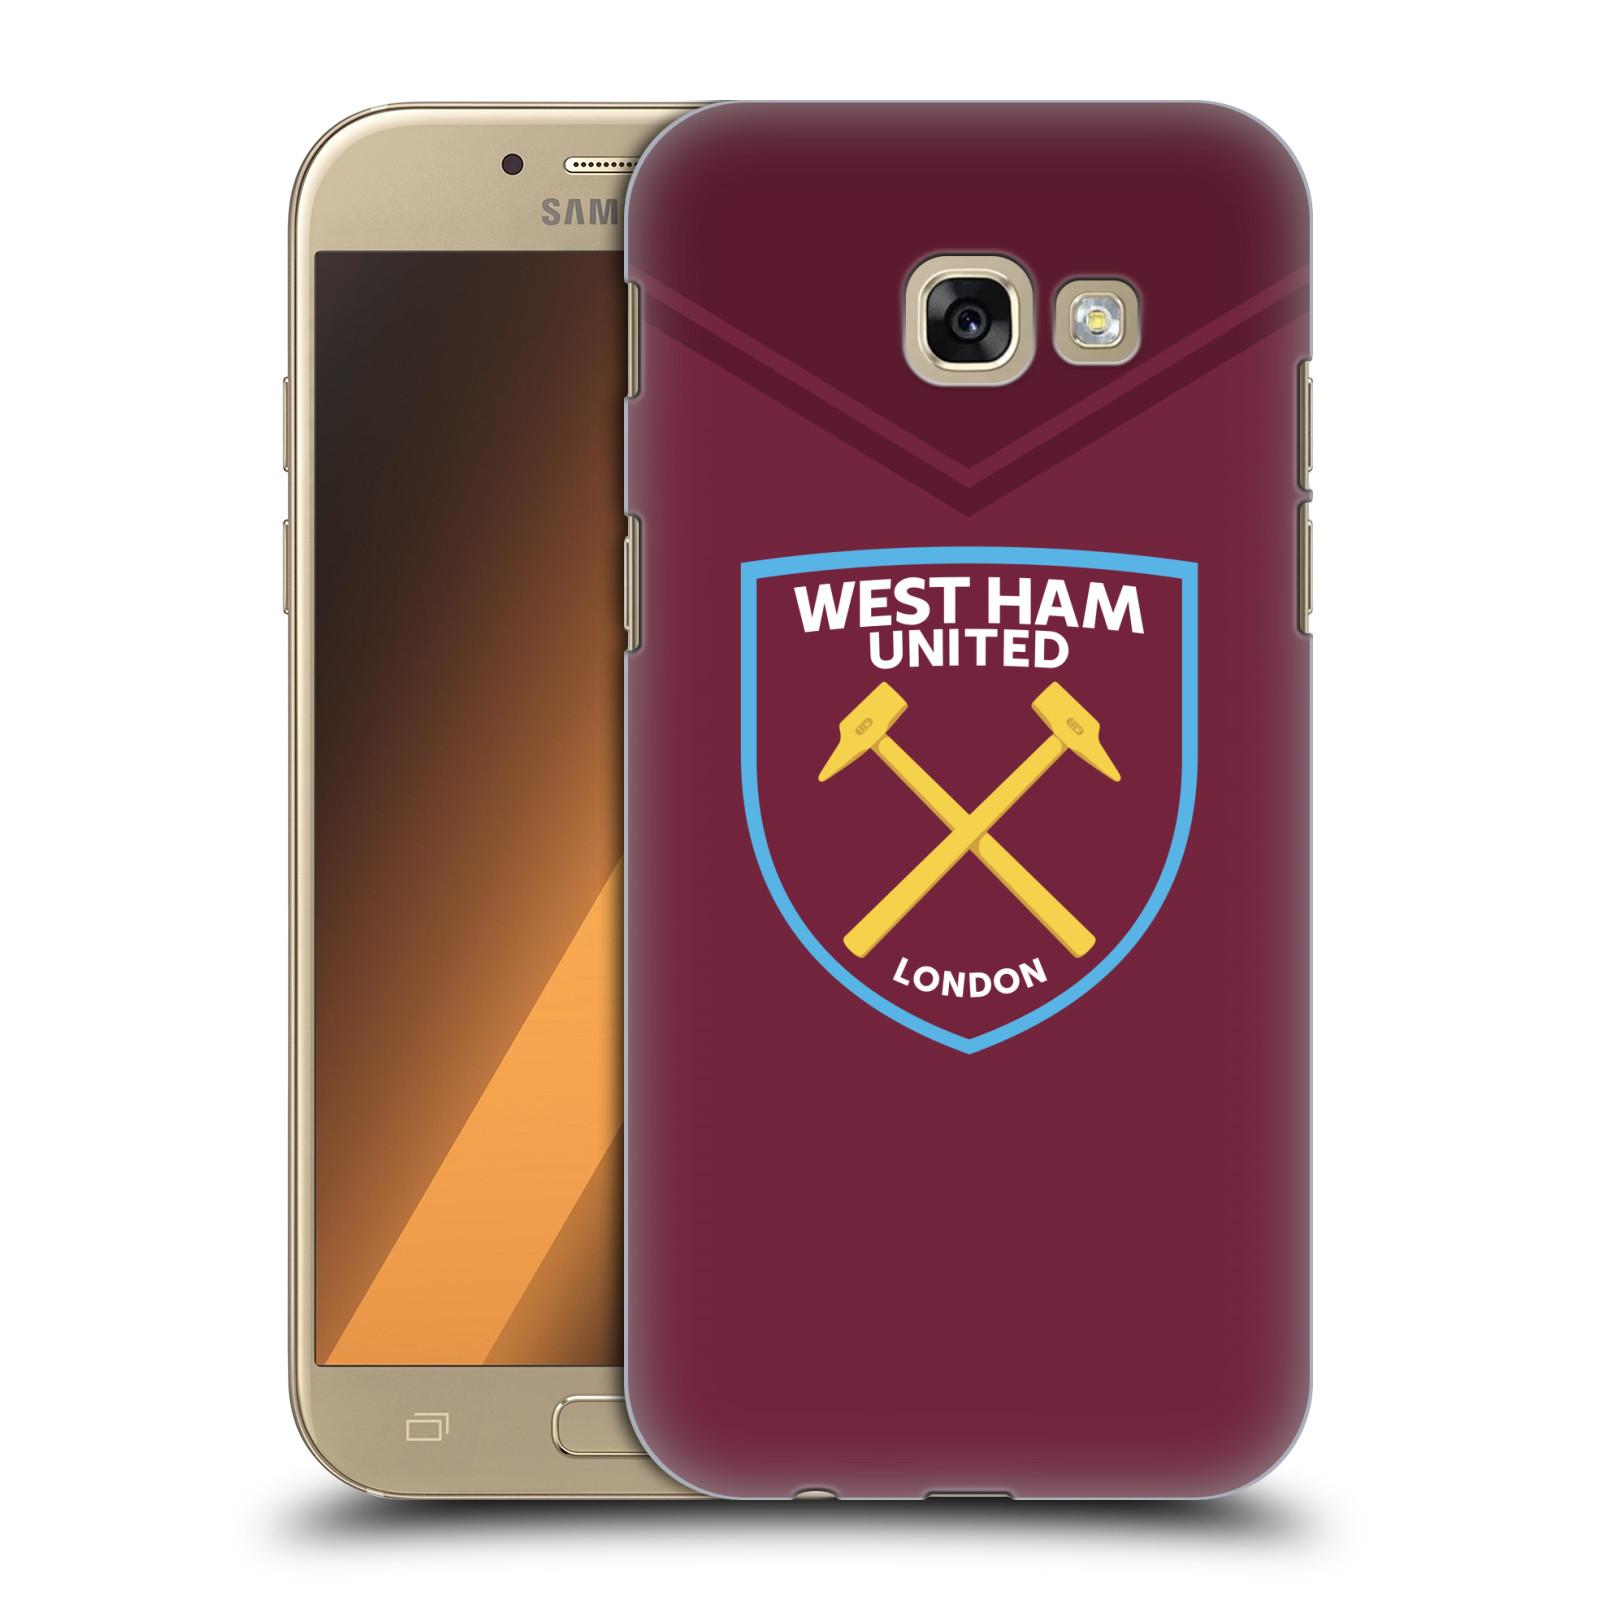 Plastové pouzdro na mobil Samsung Galaxy A5 (2017) - Head Case - West Ham United - Logo